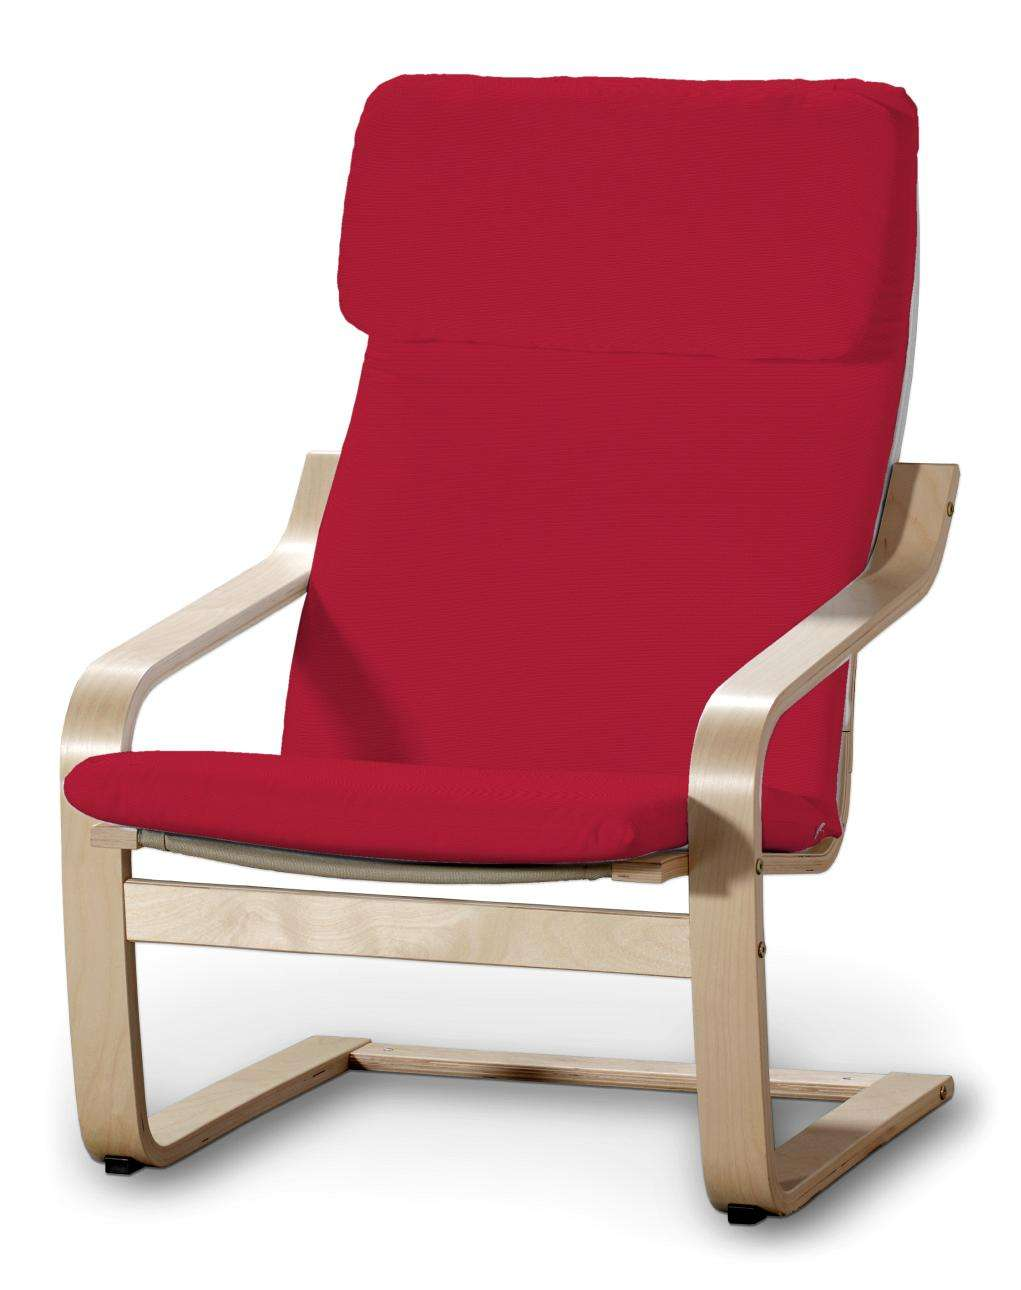 Poduszka na fotel Poäng w kolekcji Cotton Panama, tkanina: 702-04